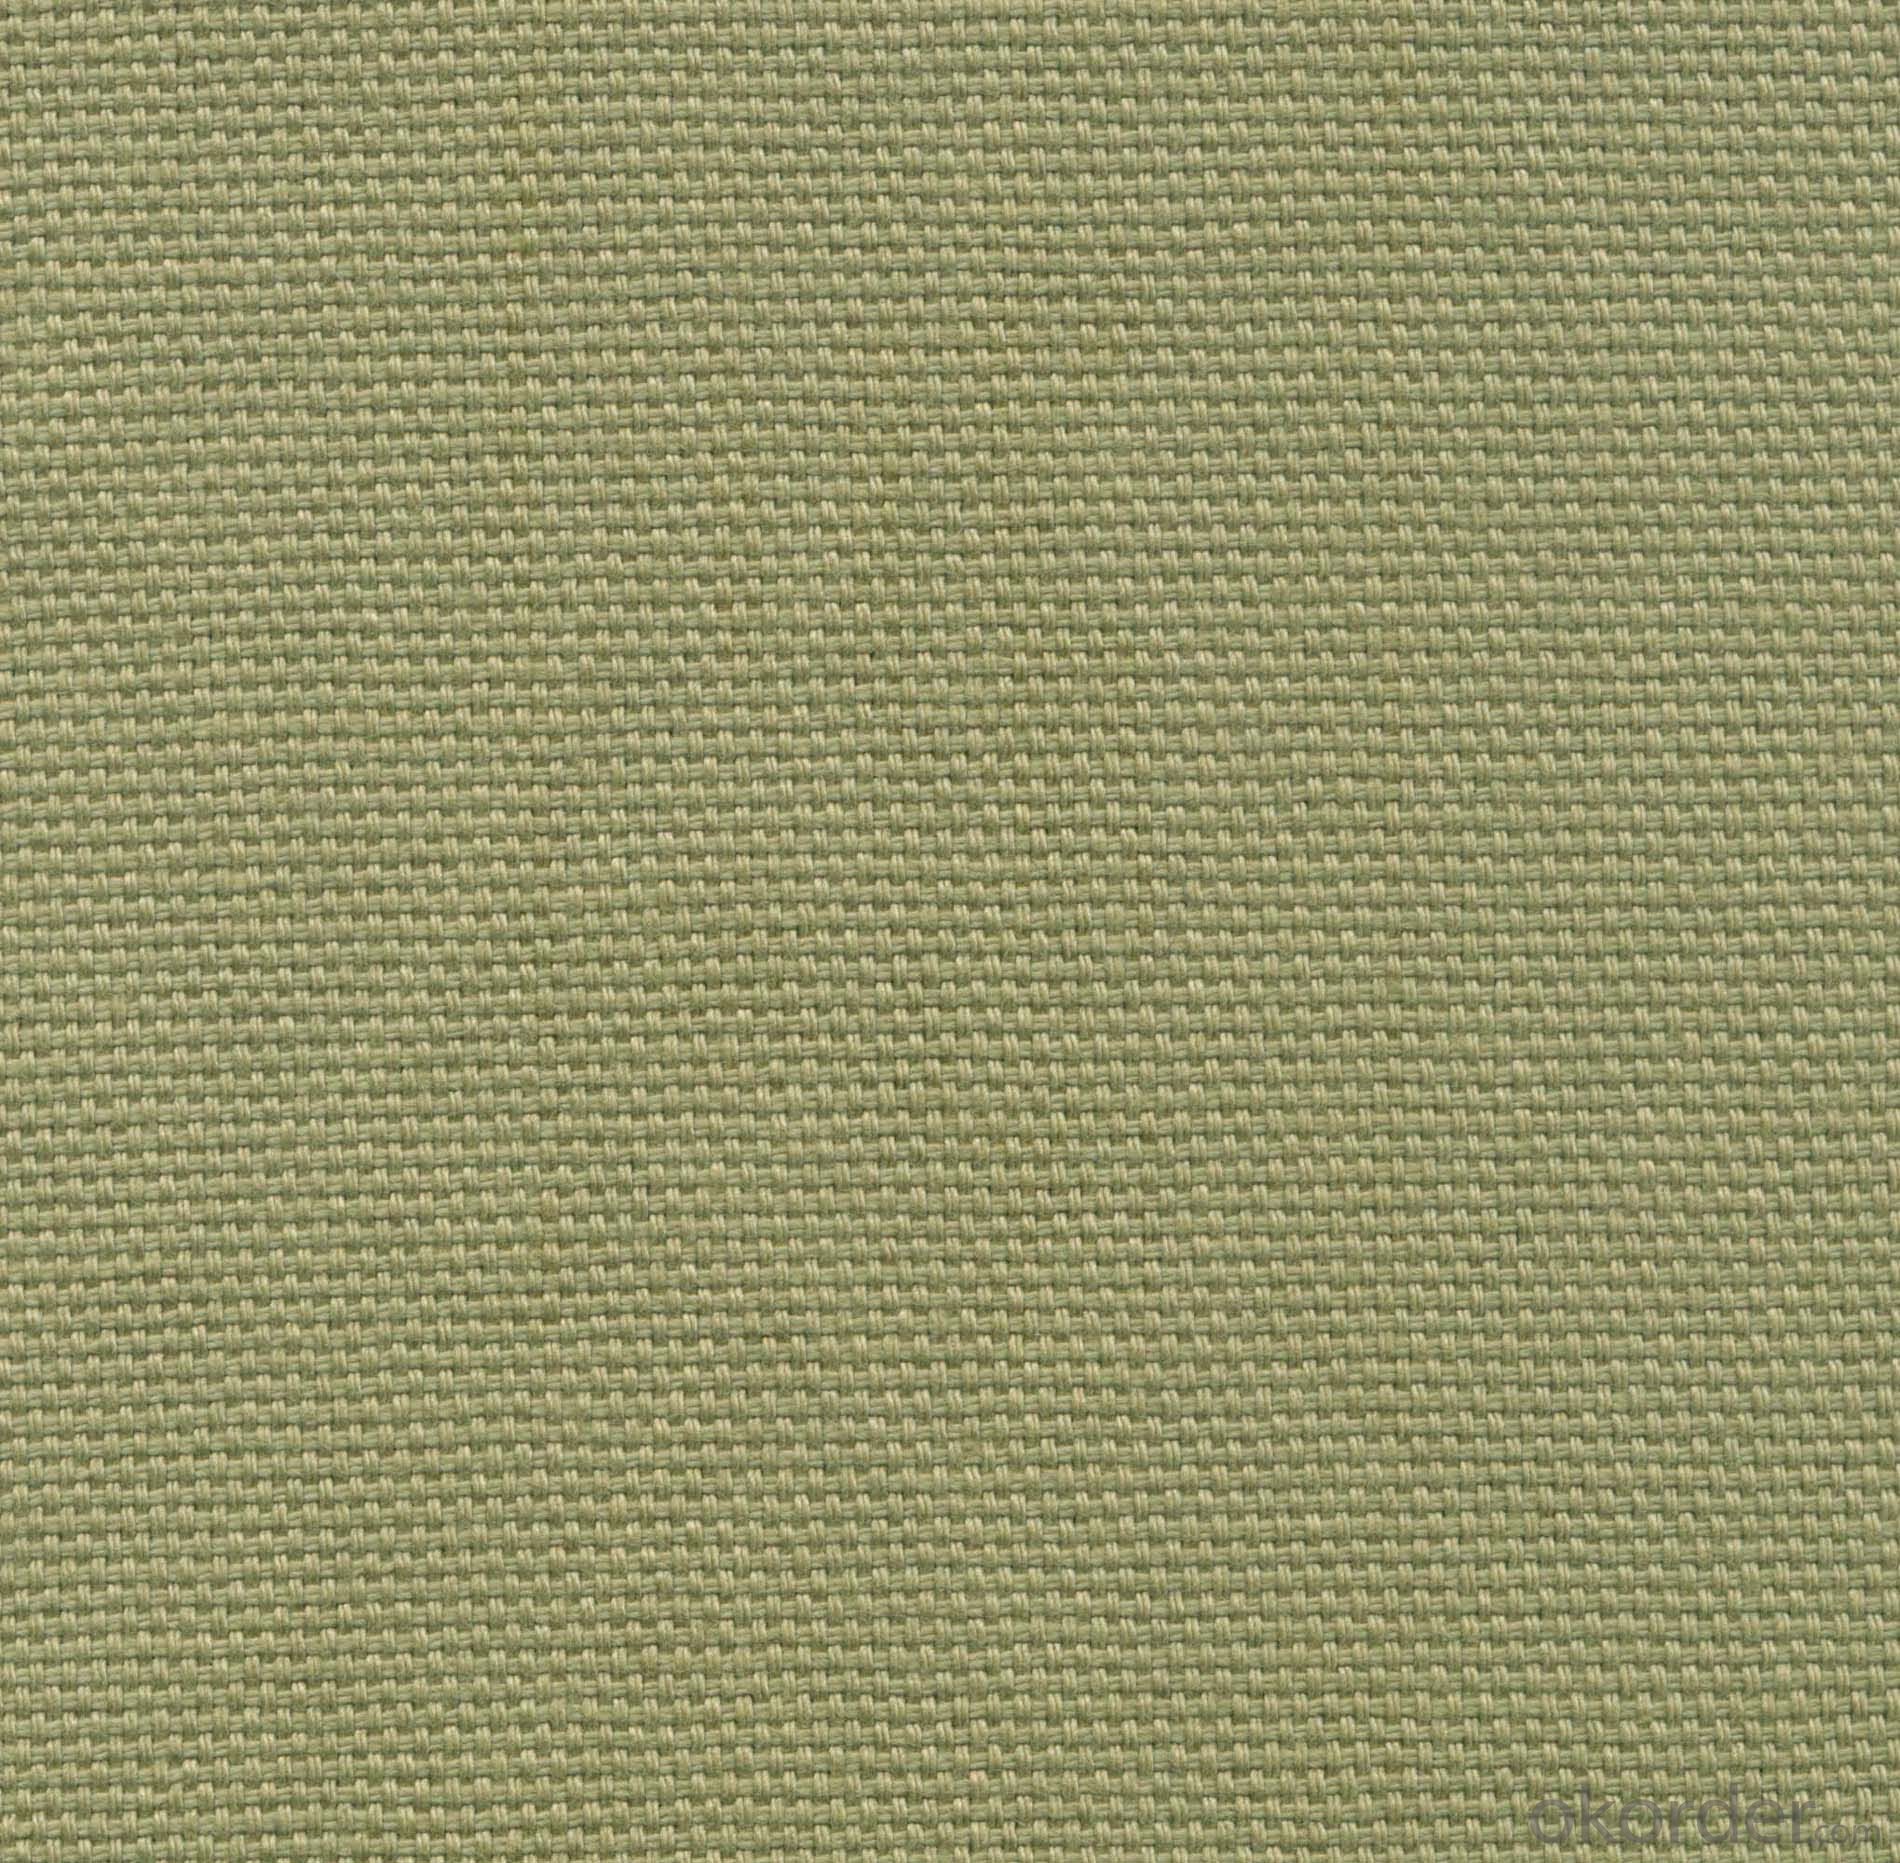 TR SAND-WASH.GABARDINE FABRIC W007/40/2x300D 108x56